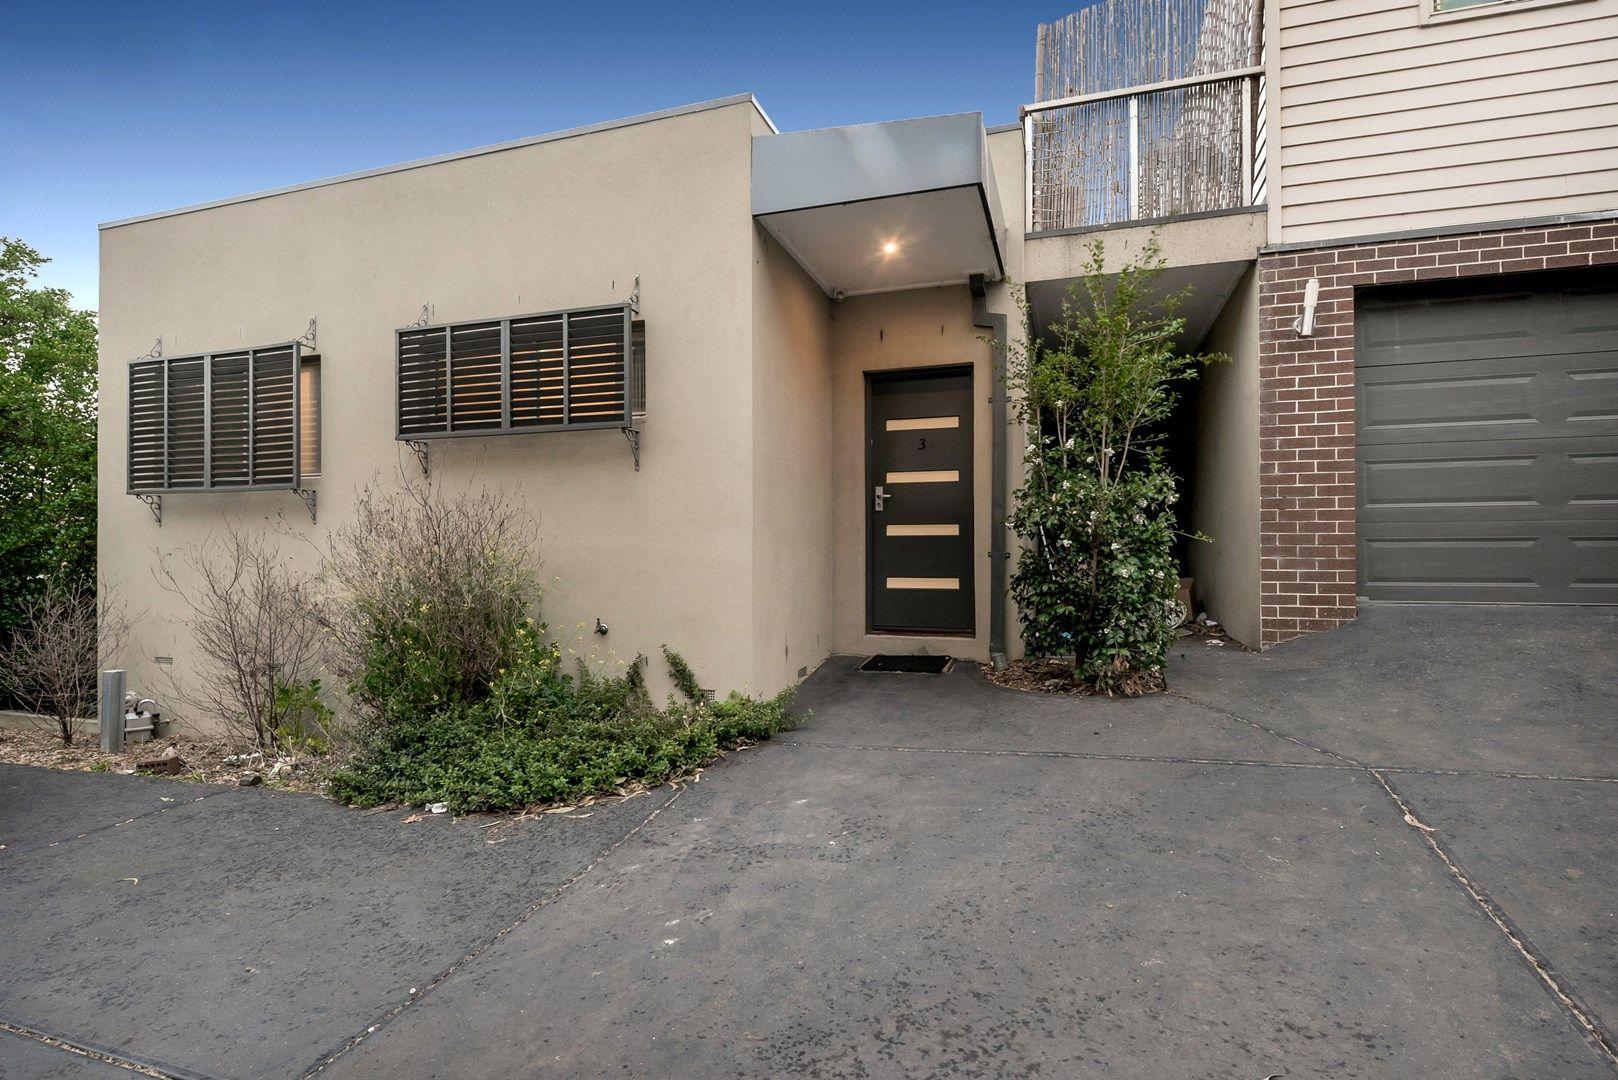 3/213-215 Albert Street, Reservoir VIC 3073, Image 0